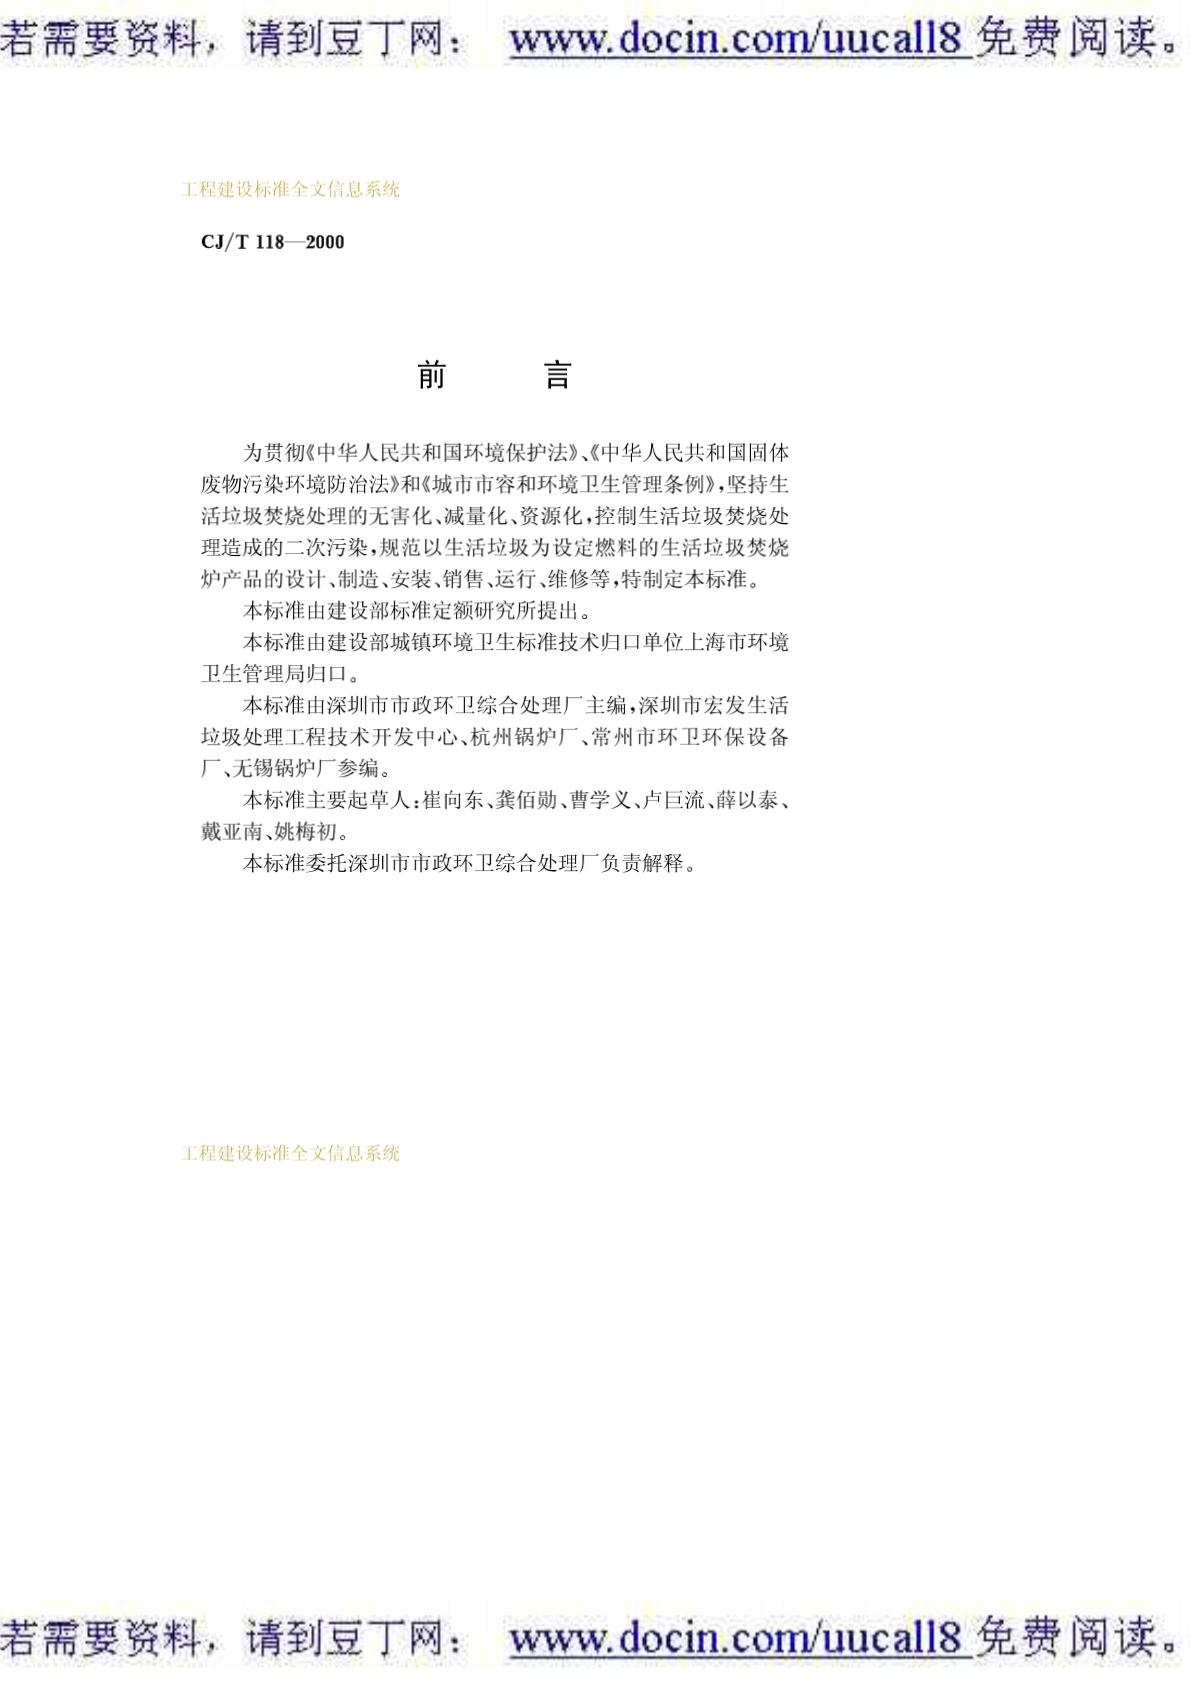 CJ城建标准大全CJT 118-2000 生活垃圾焚烧炉-图二